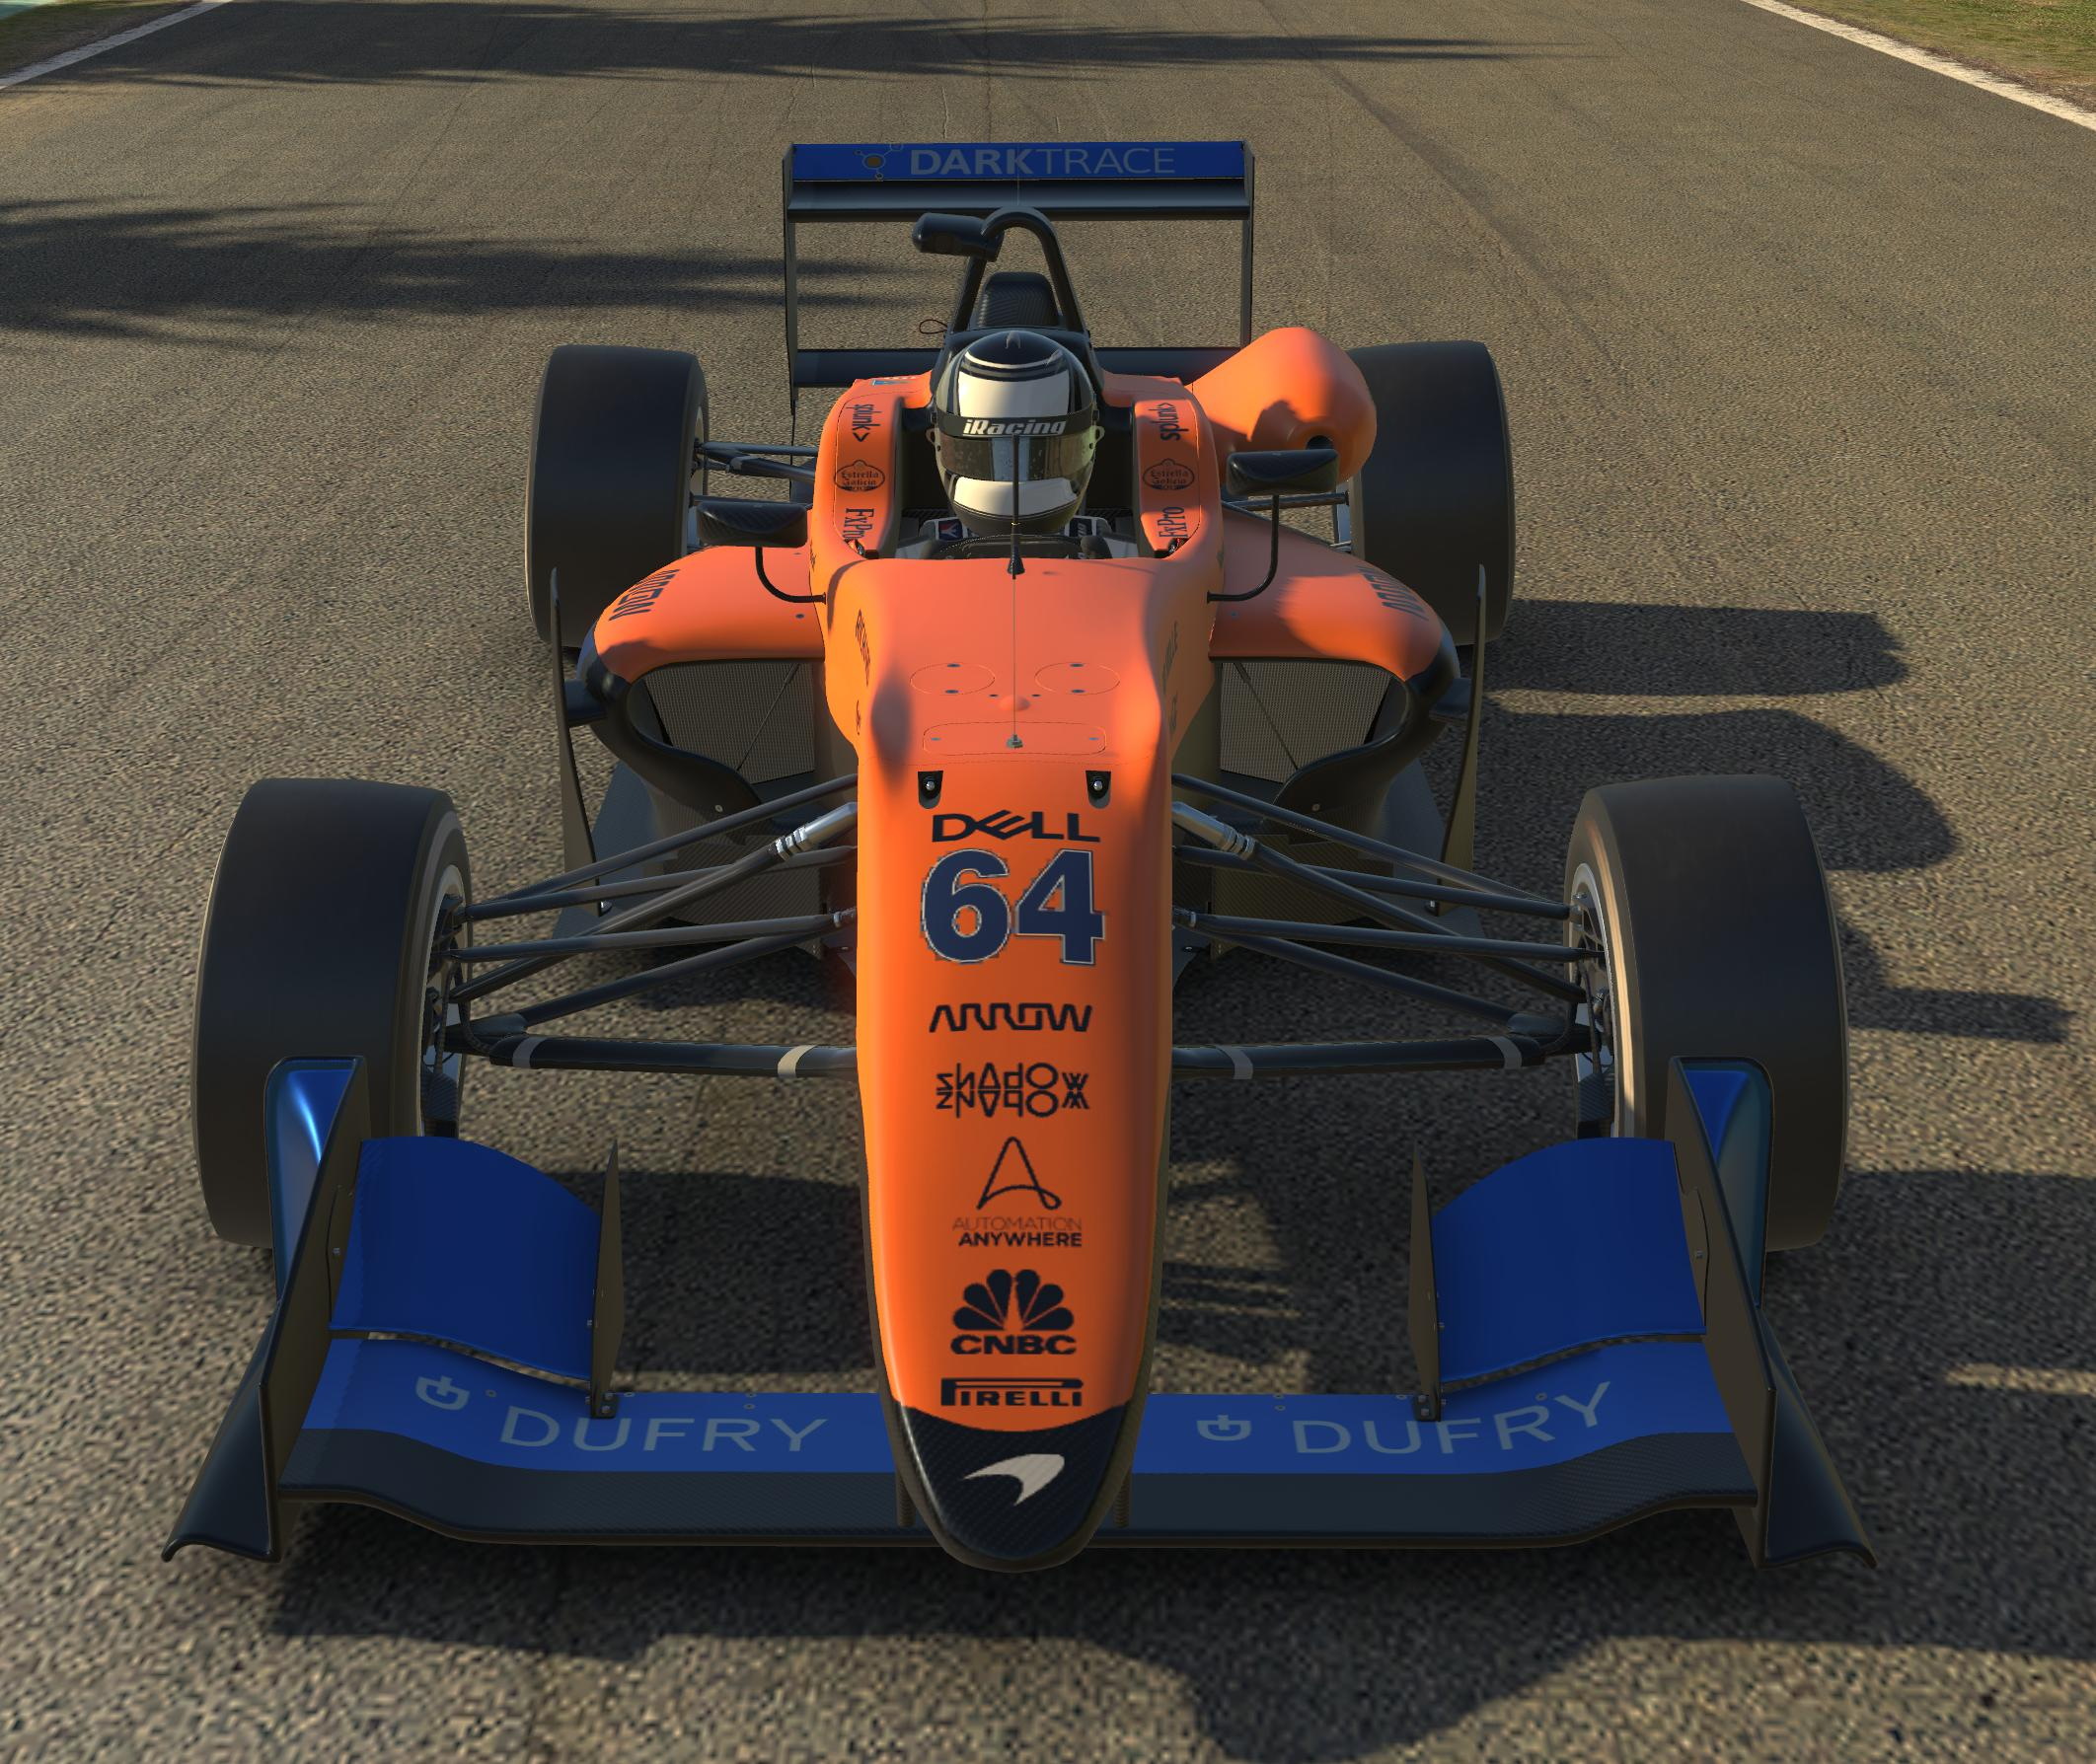 Preview of McLaren 2020 with Latest Logos by Ricardo Gutierrez